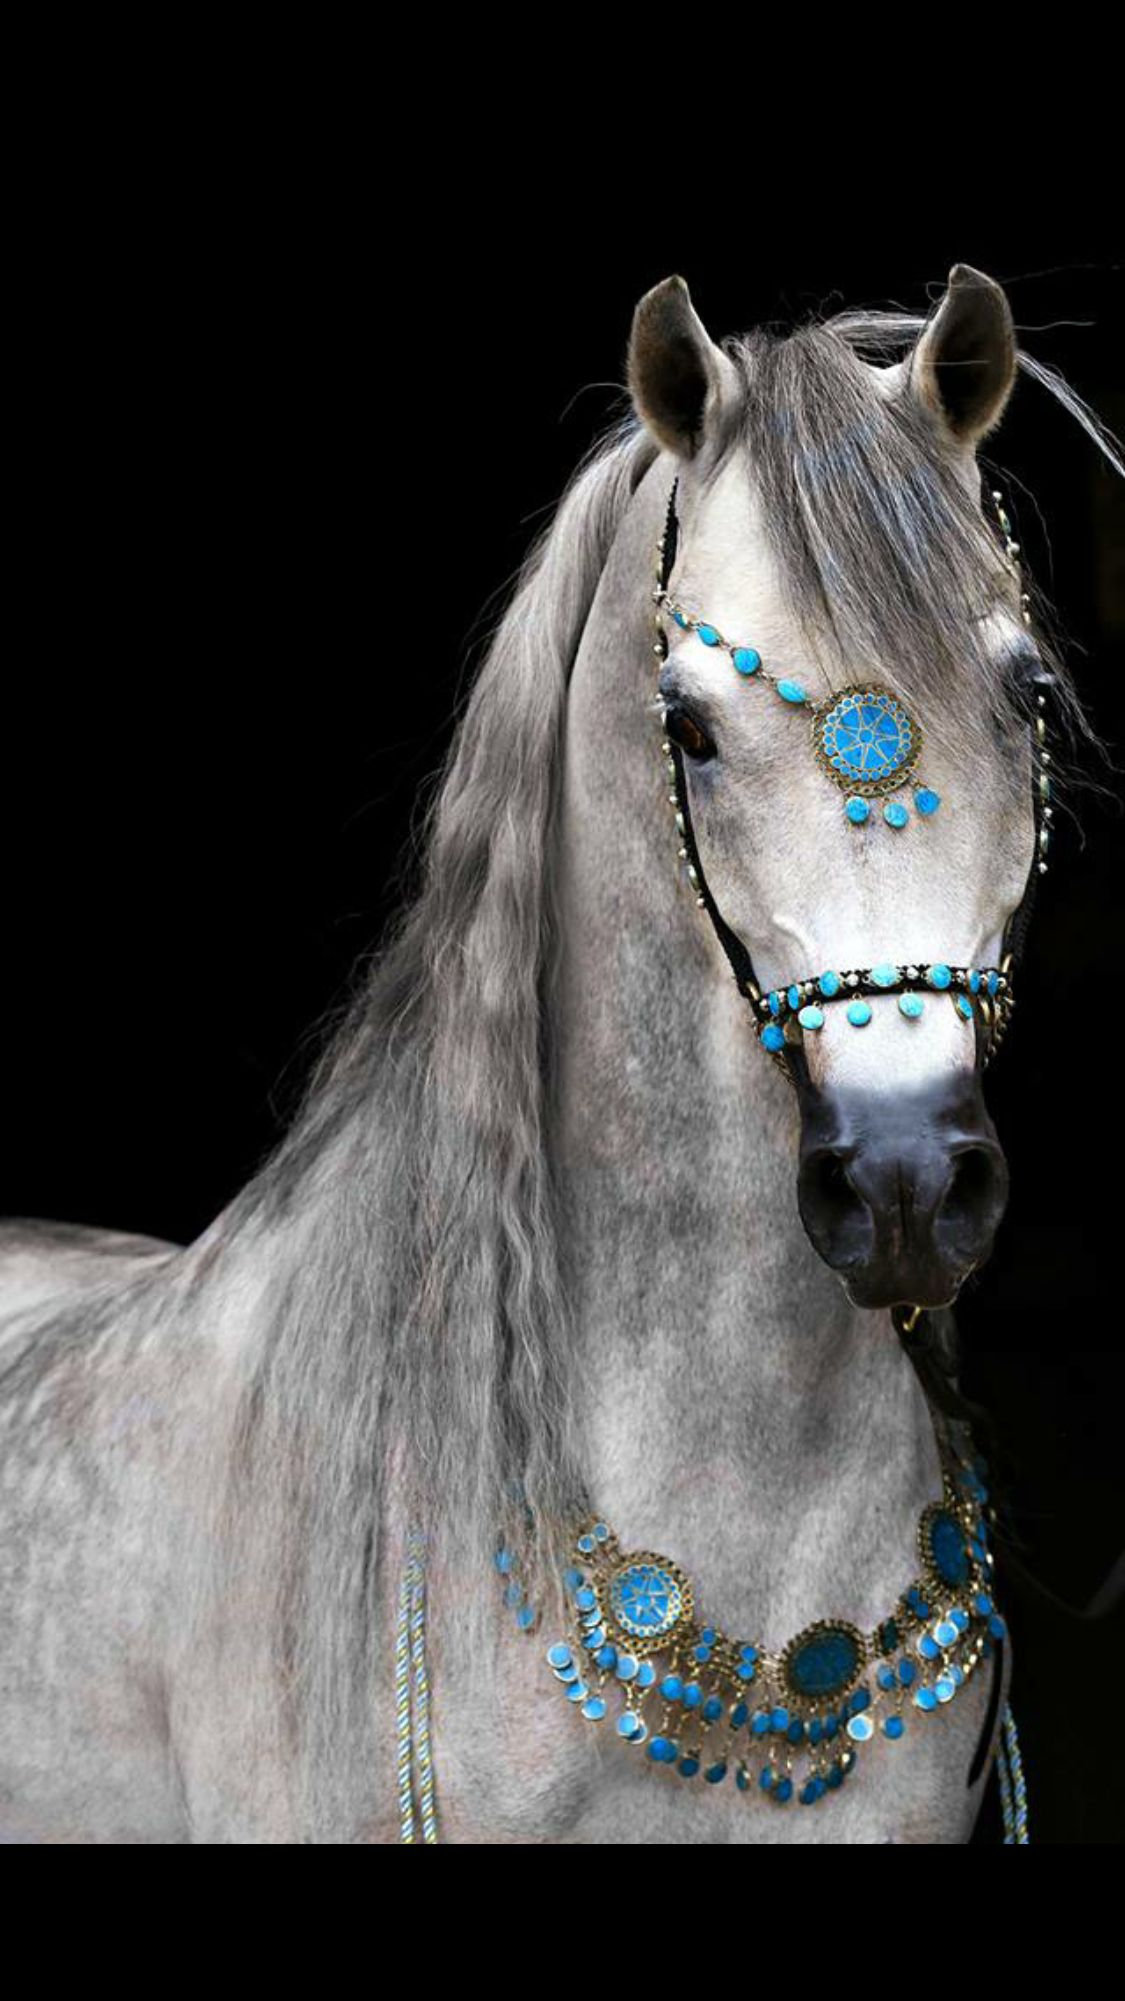 arabianhorses desert life pinterest pferde. Black Bedroom Furniture Sets. Home Design Ideas